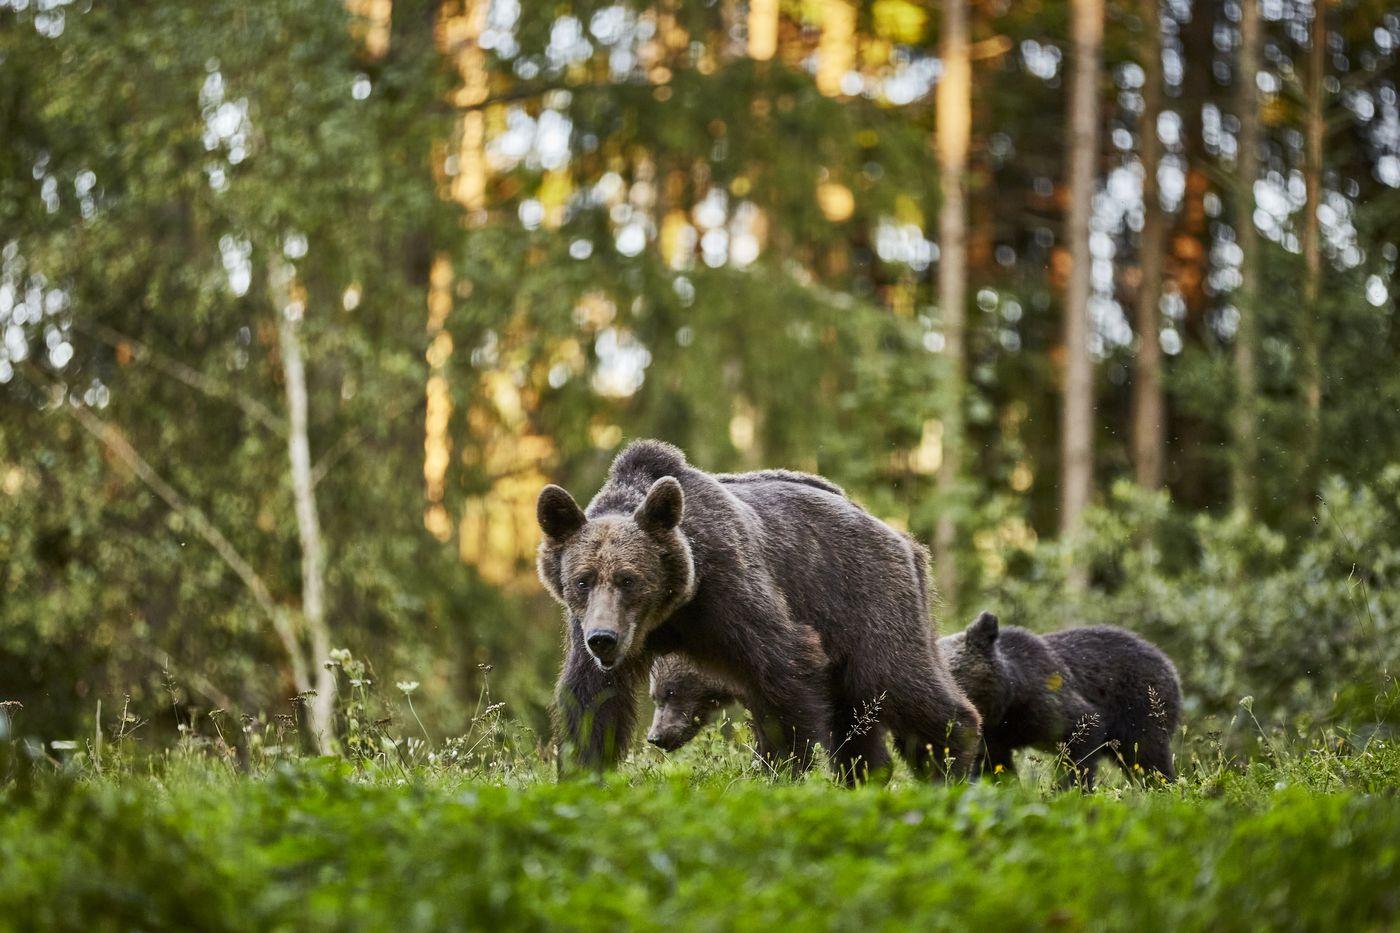 On Bear's Land itinerary.